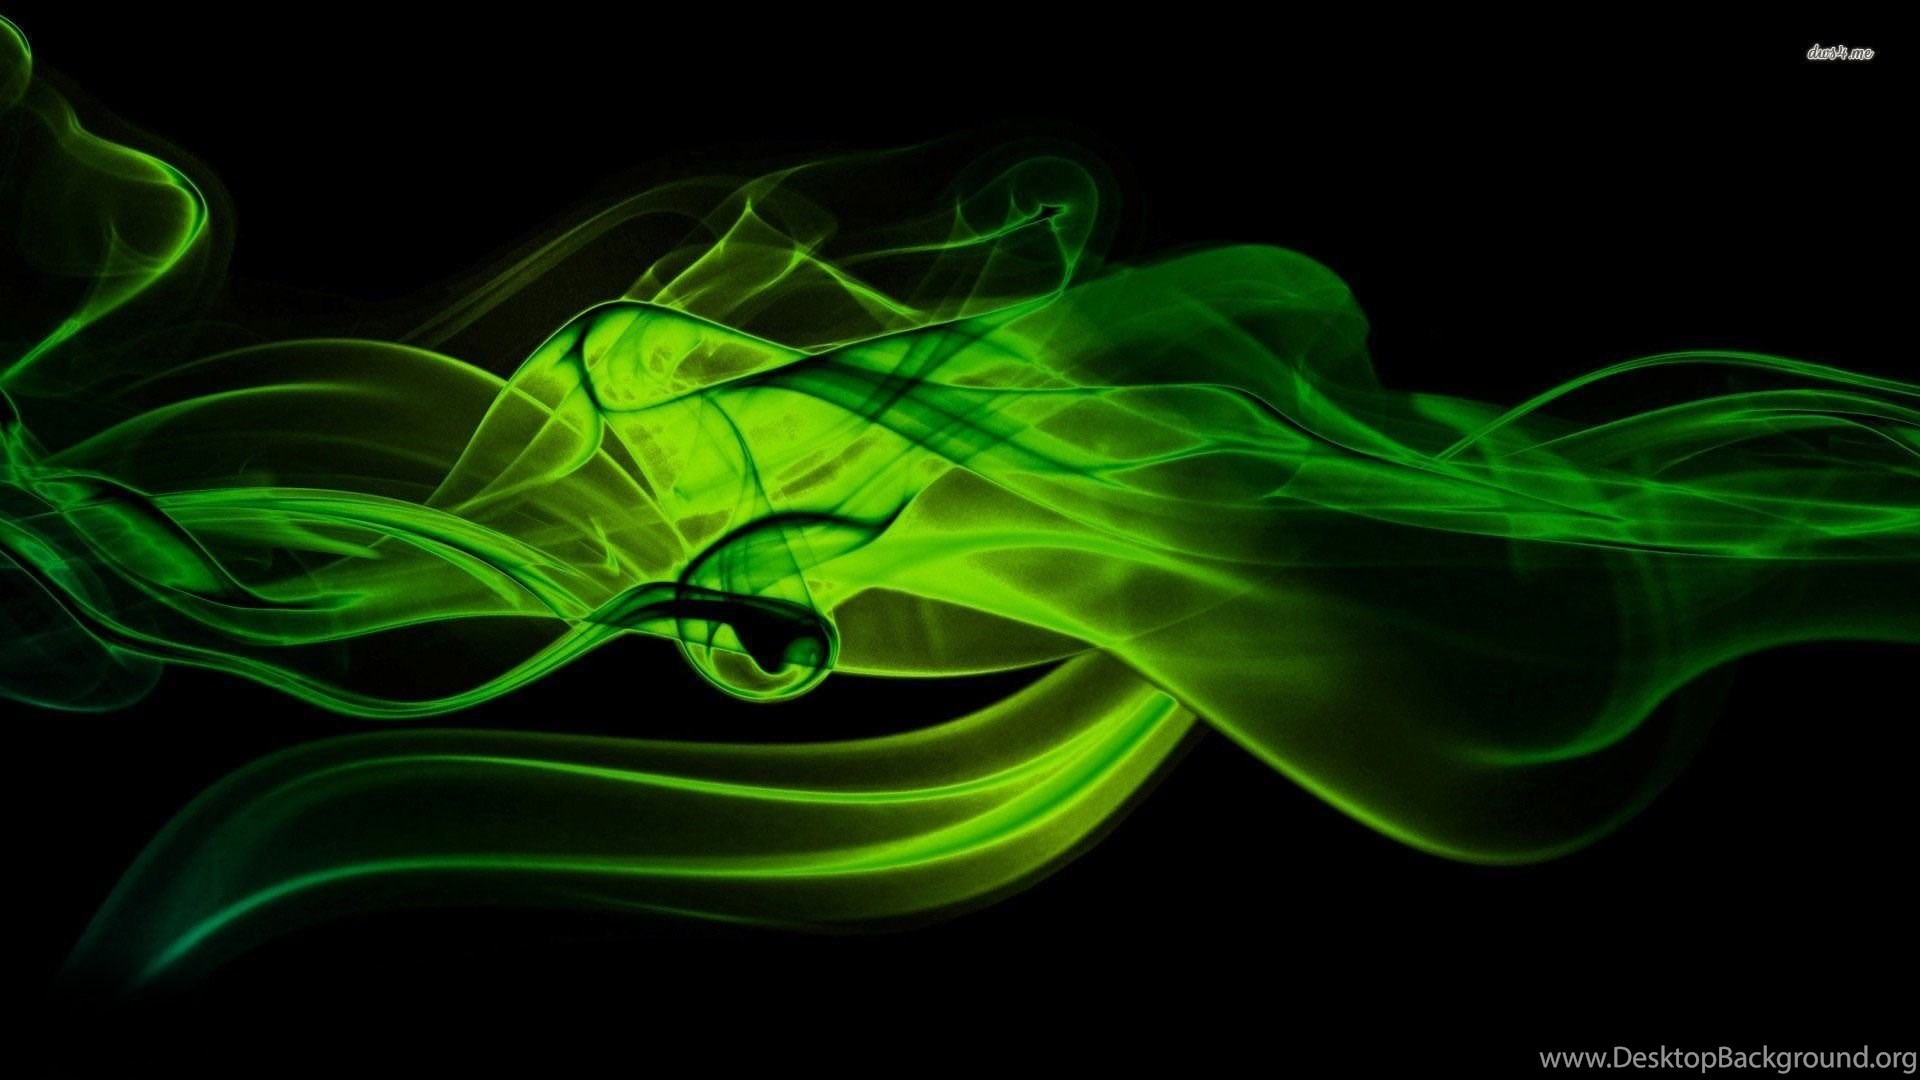 Green Smoke Wallpapers Abstract Wallpapers Desktop Background